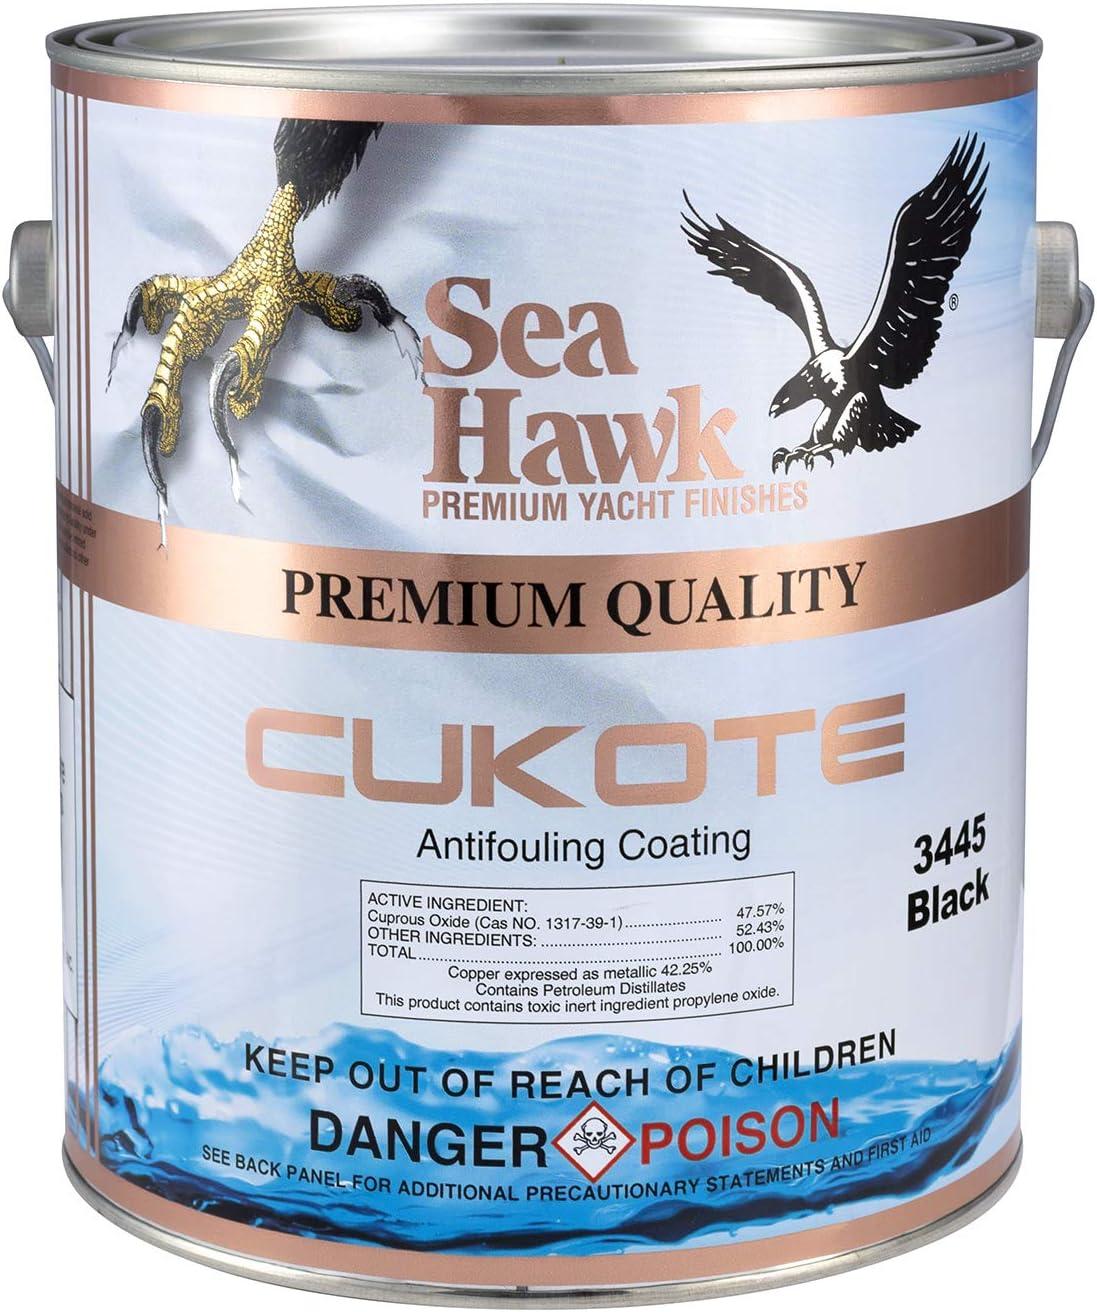 Sea Hawk Cukote Paint